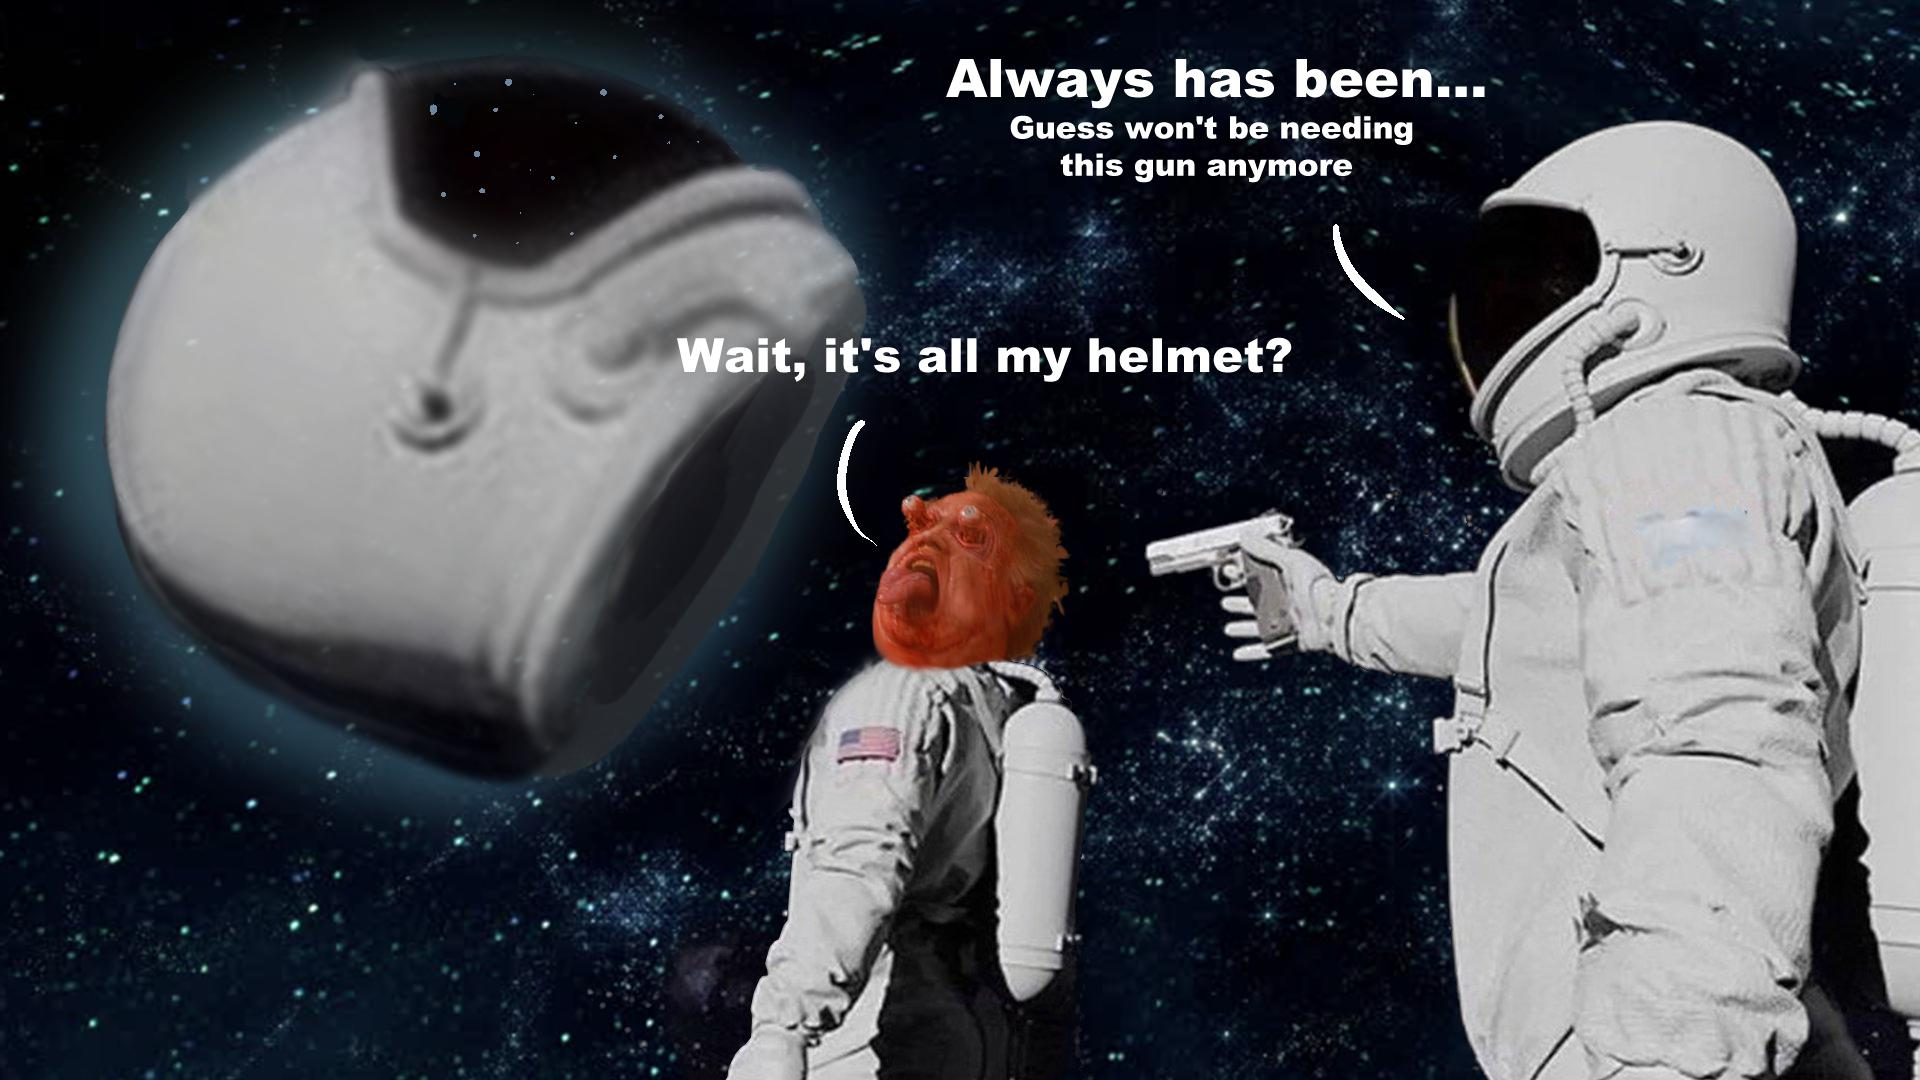 its all my helmet meme, its all my helmet astronaut gun meme, its all my helmet astronaut meme, always has been meme, always has been memes, astronaut gun meme, astronaut gun memes, wait its all meme, wait its all memes, wait its all always has been meme, wait its all always has been memes, astronaut with a gun meme, astronaut with a gun memes, astronaut with gun meme, astronaut with gun memes, astronaut conspiracy meme, astronaut conspiracy memes, space conspiracy meme, space conspiracy memes, funny astronaut gun meme, funny astronaut with gun meme, funny astronaut gun memes, funny astronaut with gun memes, funny always has been meme, funny always has been memes, funny wait its all meme, funny wait its all memes, funny astronaut meme, funny astronaut memes, conspiracy theory meme, conspiracy theory memes, conspiracy theories meme, conspiracy theories memes, funny conspiracy theory meme, funny conspiracy theory memes, funny conspiracy theories meme, funny conspiracy theories memes